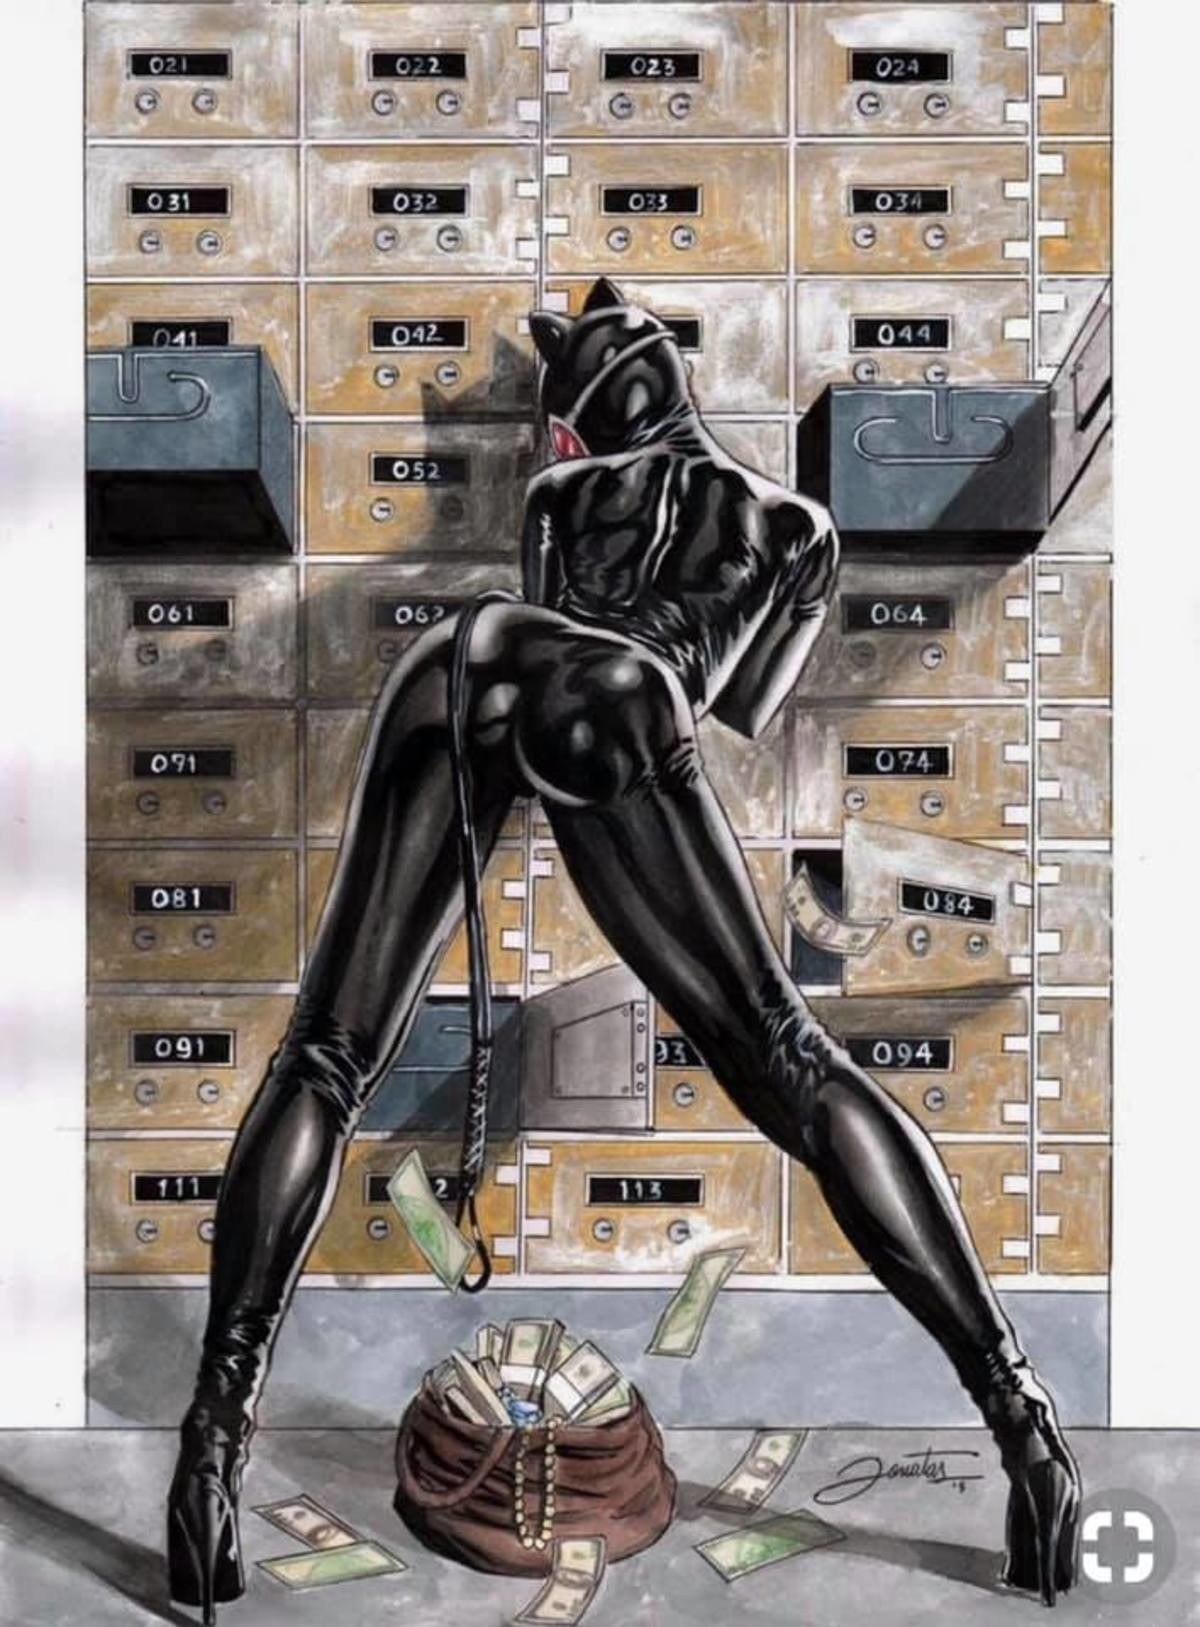 Catwoman.. .. Looks like she dumped a fat turd